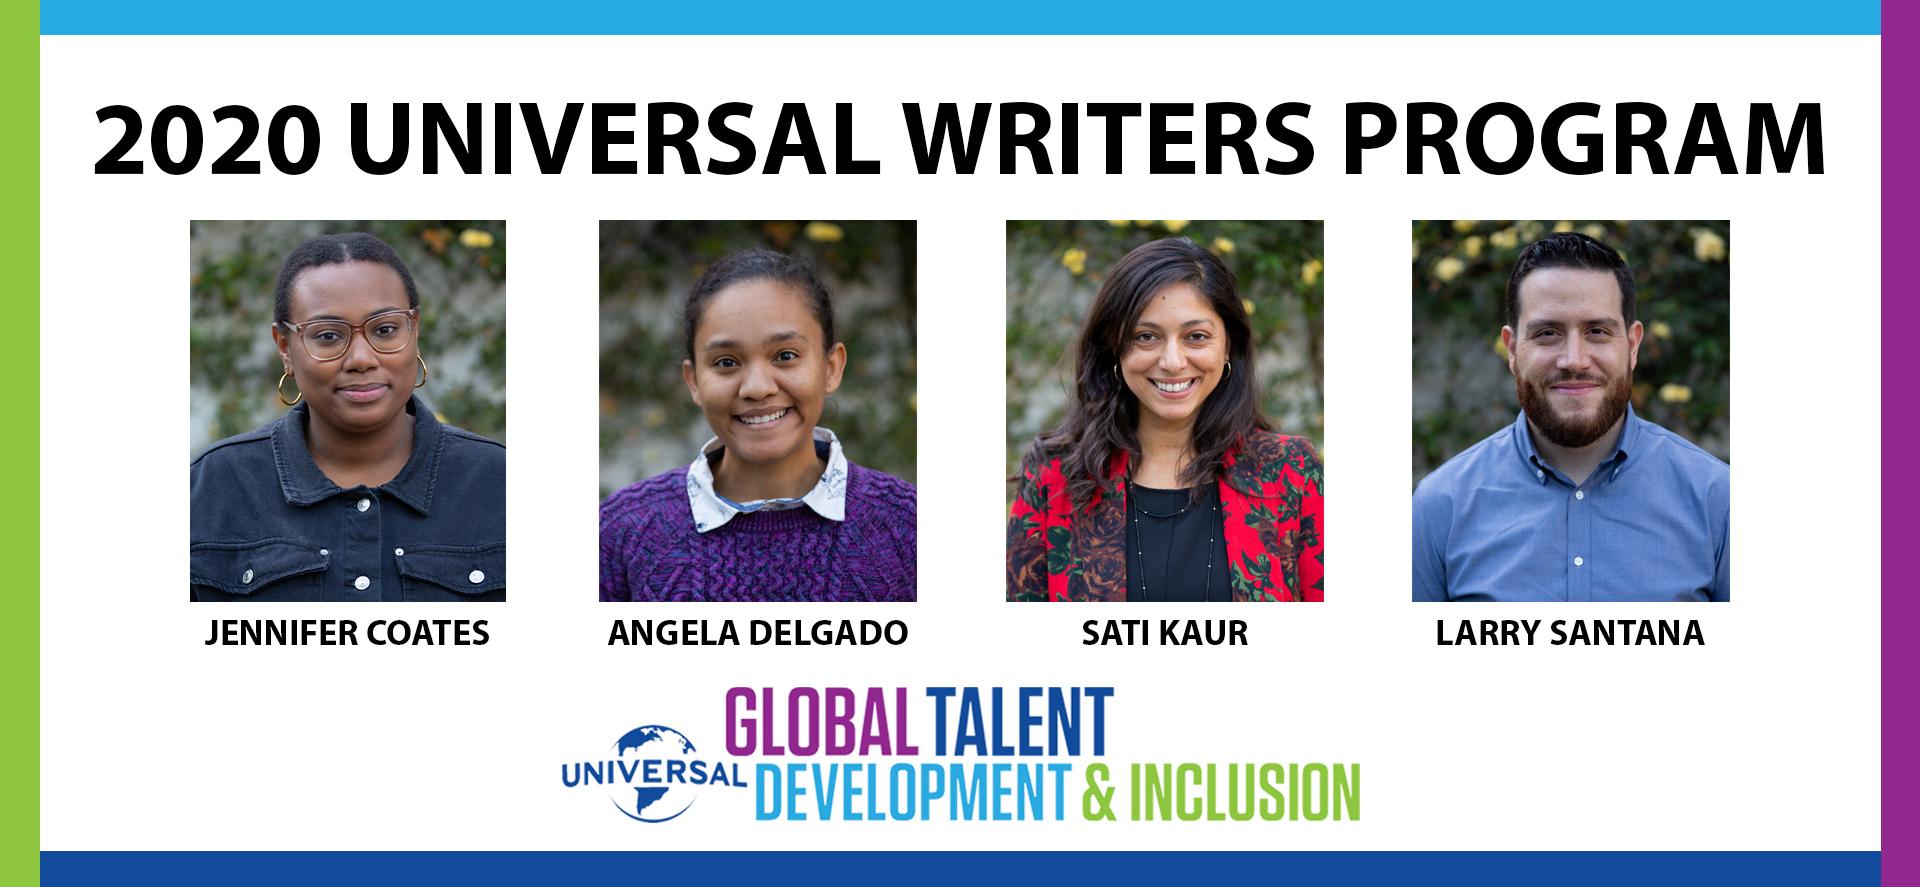 Universal Writers Program